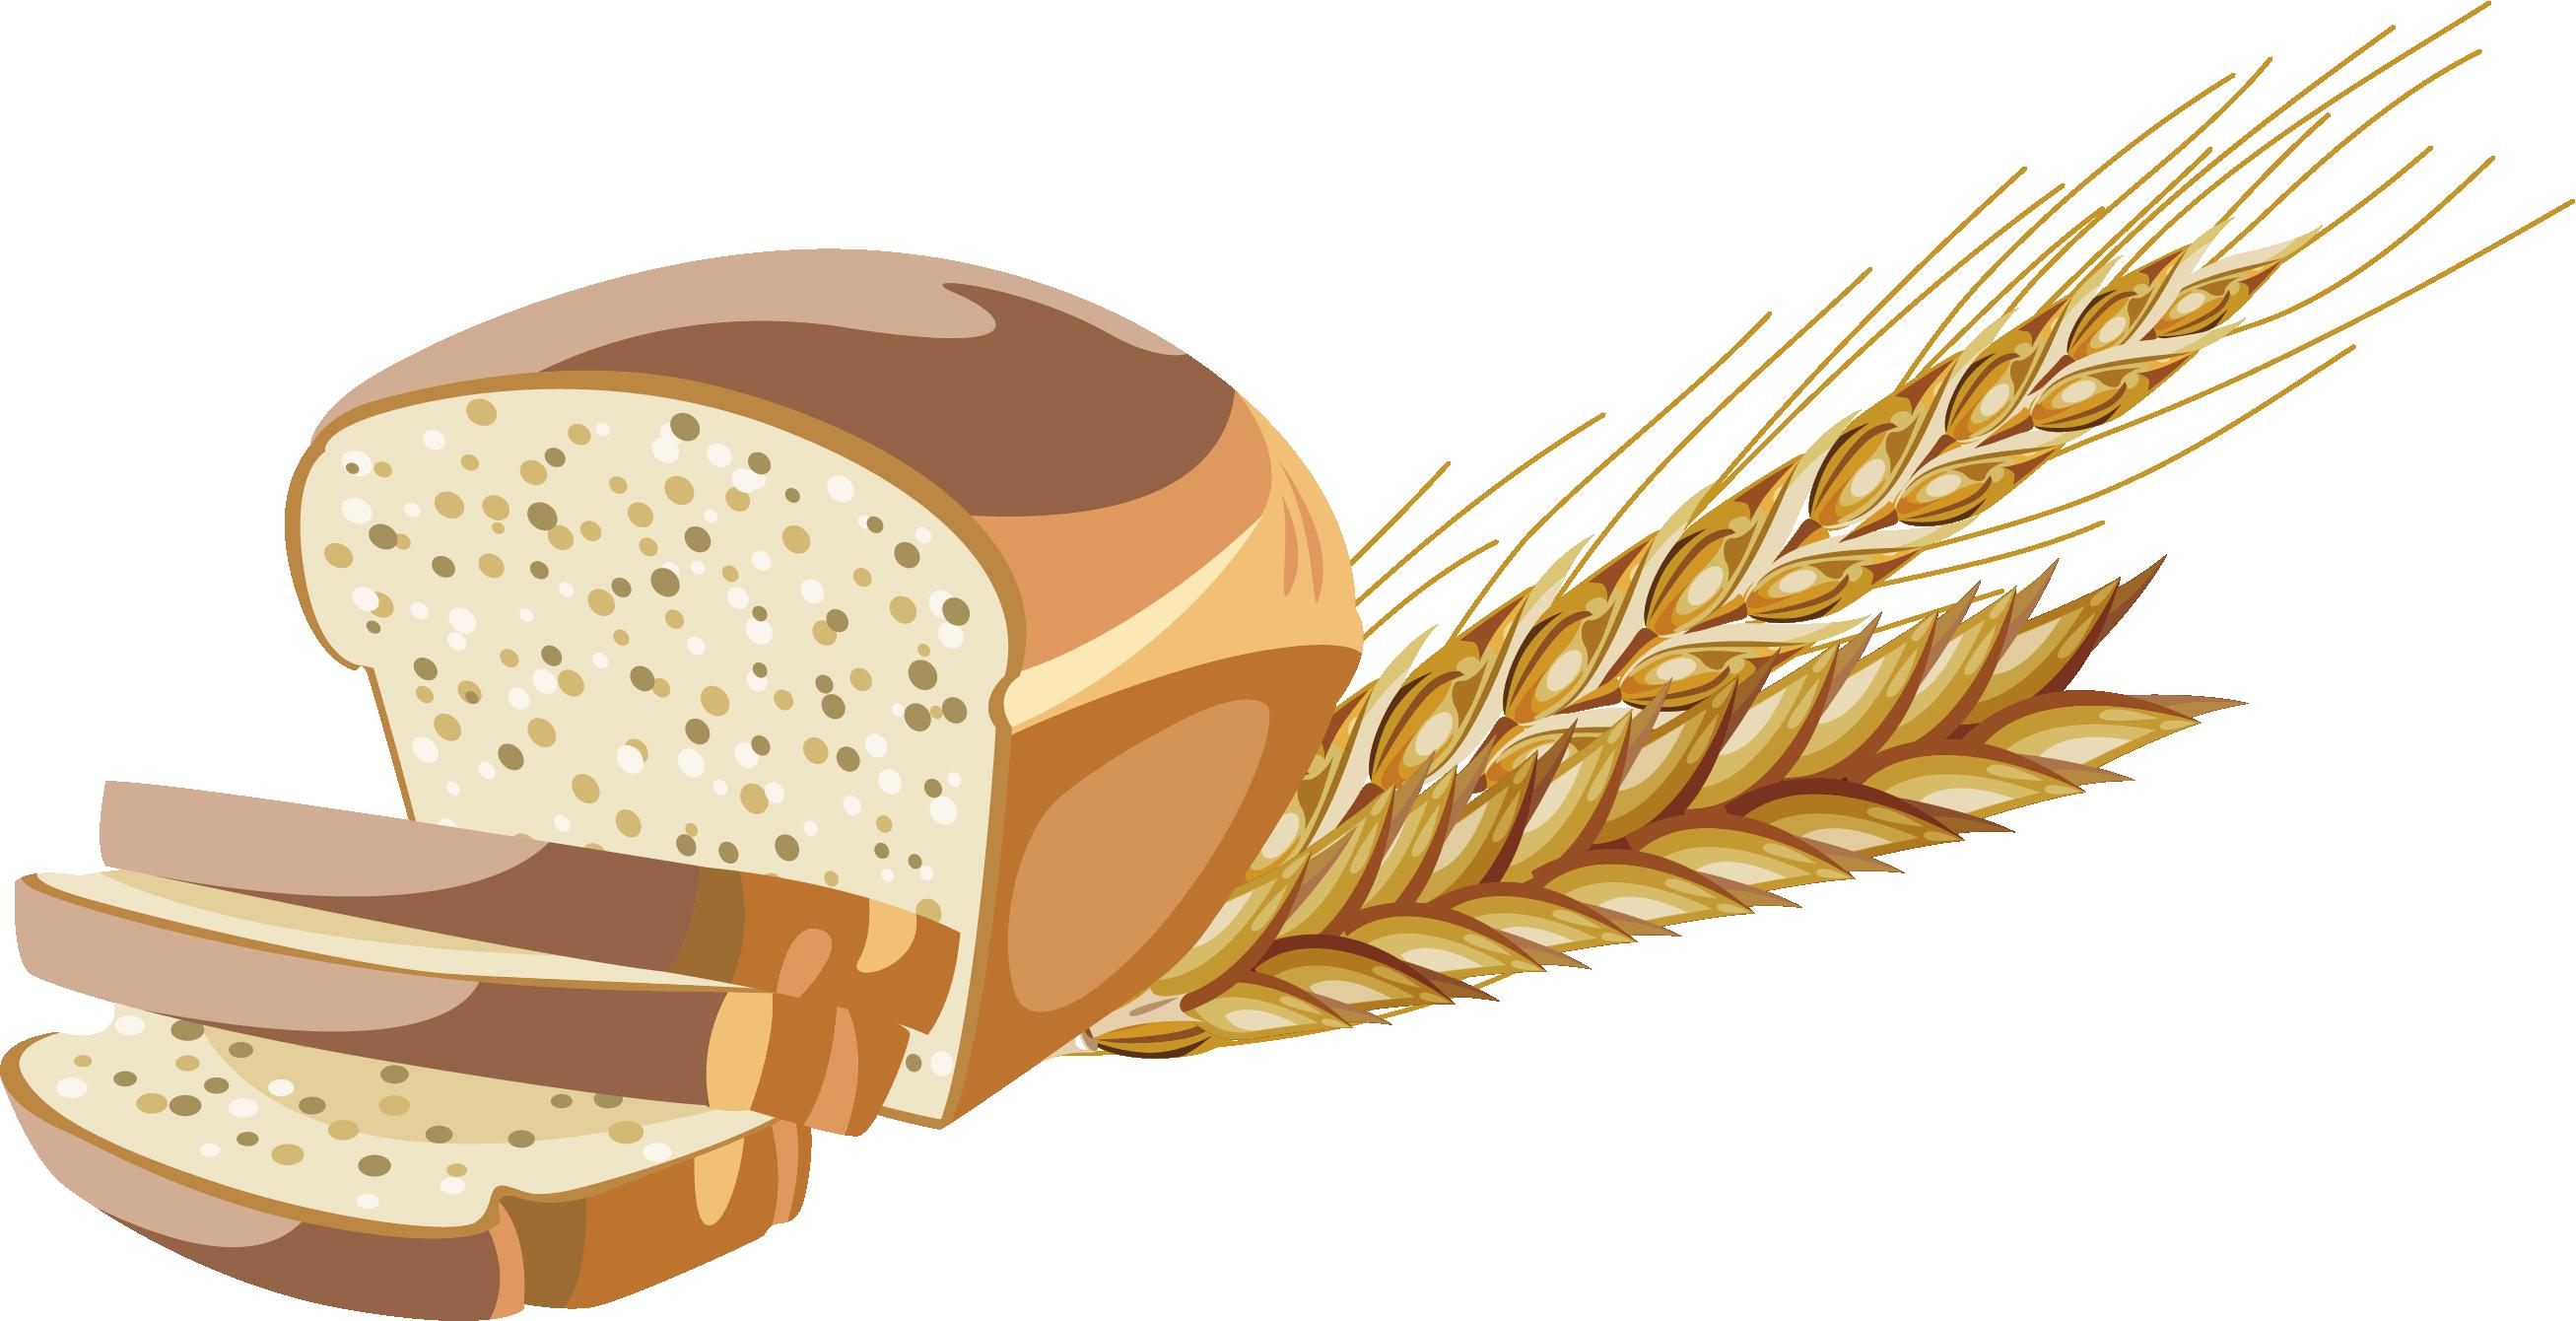 картинка значок хлеб авторские